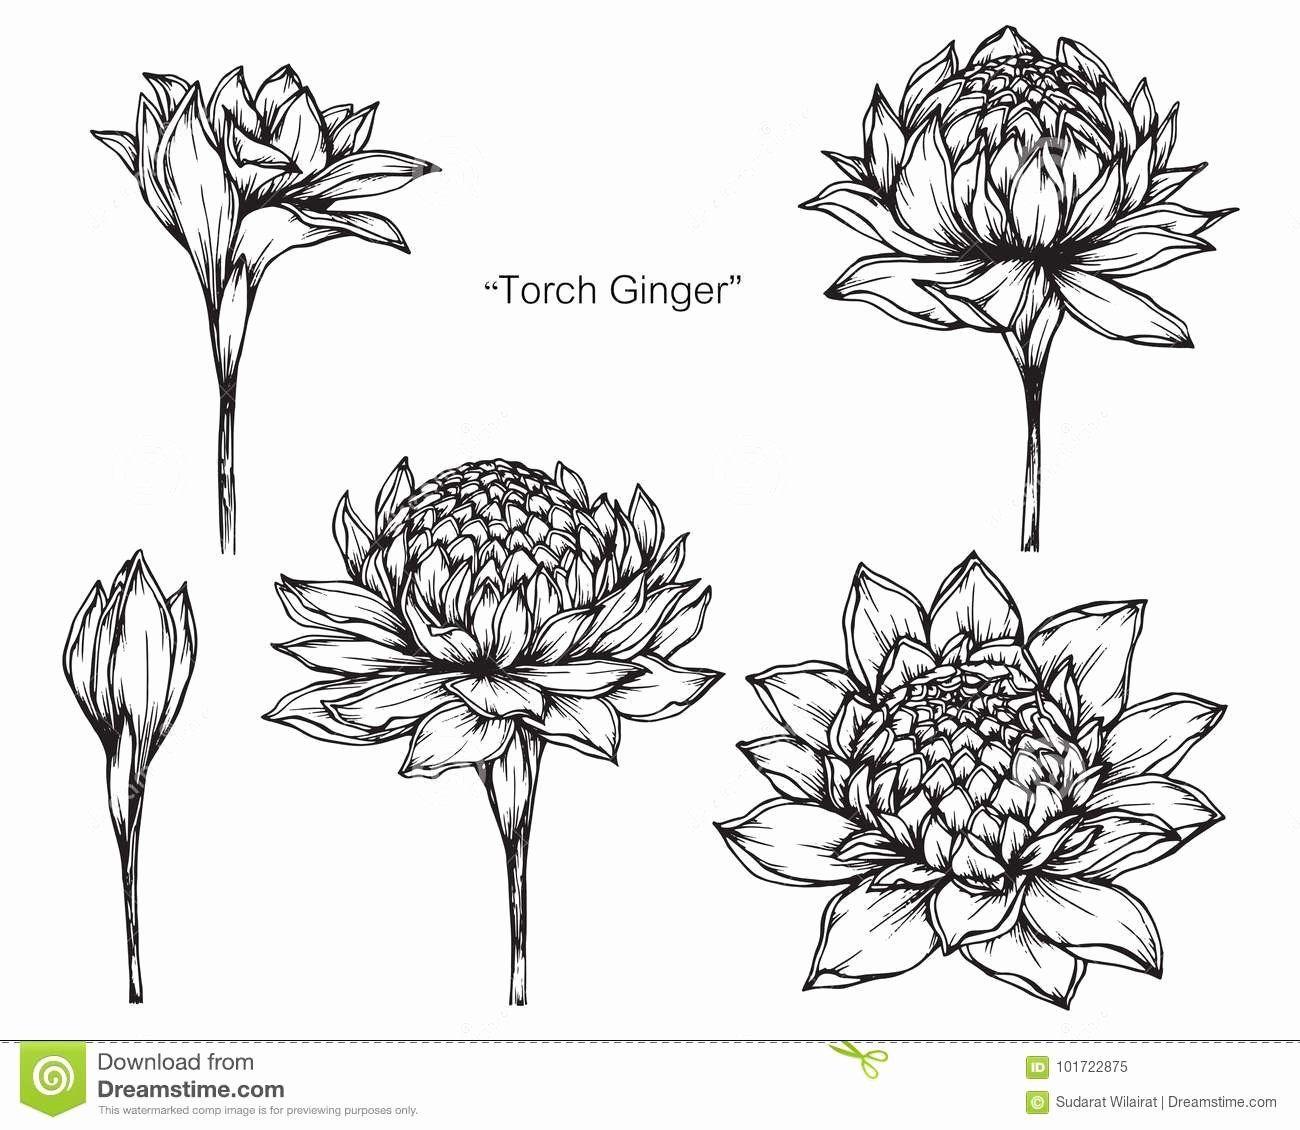 Pin By Thatakanok Phularp On Tatoveringer In 2020 Ginger Flower Torch Ginger Flower Flower Drawing